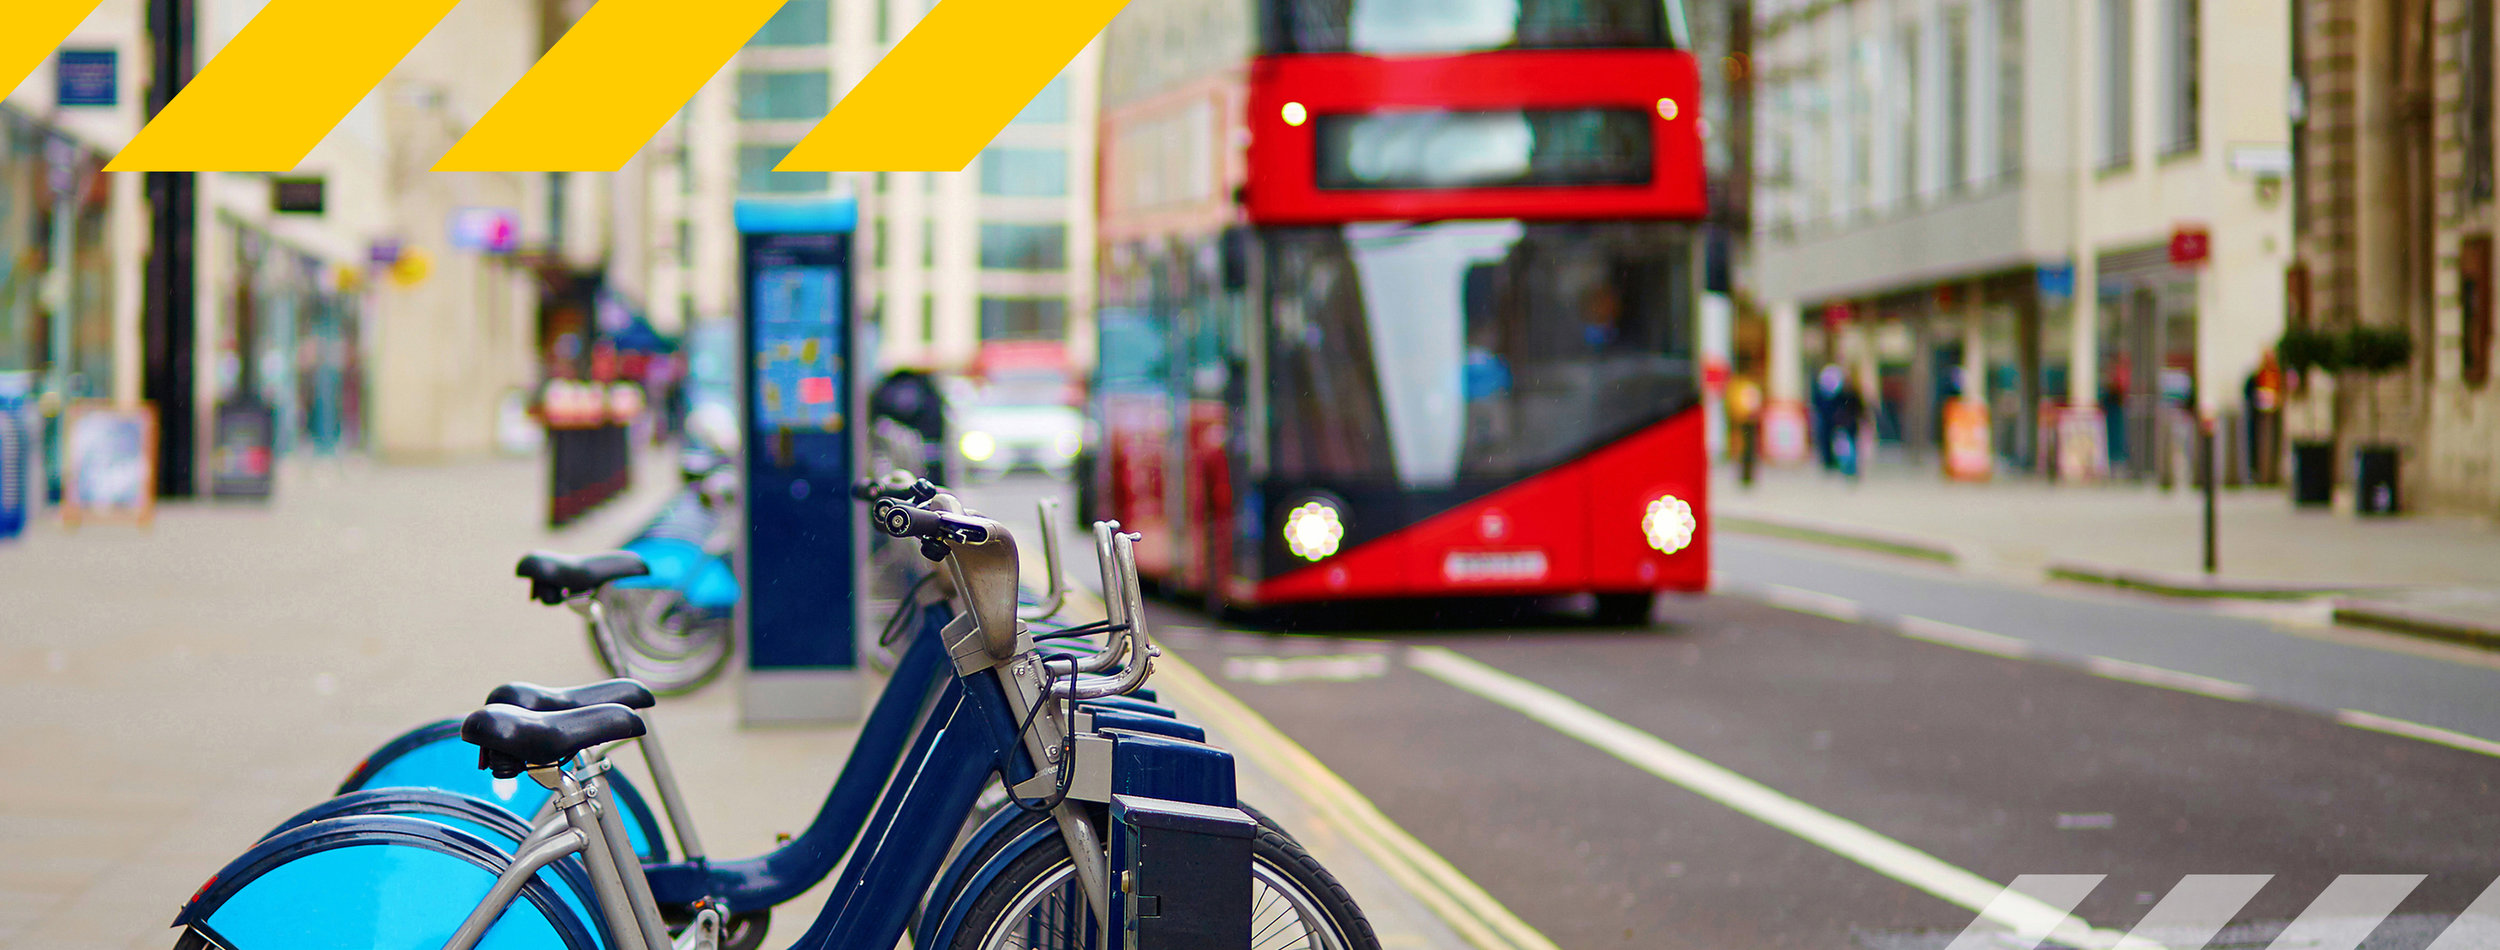 london-bus-lr.jpg